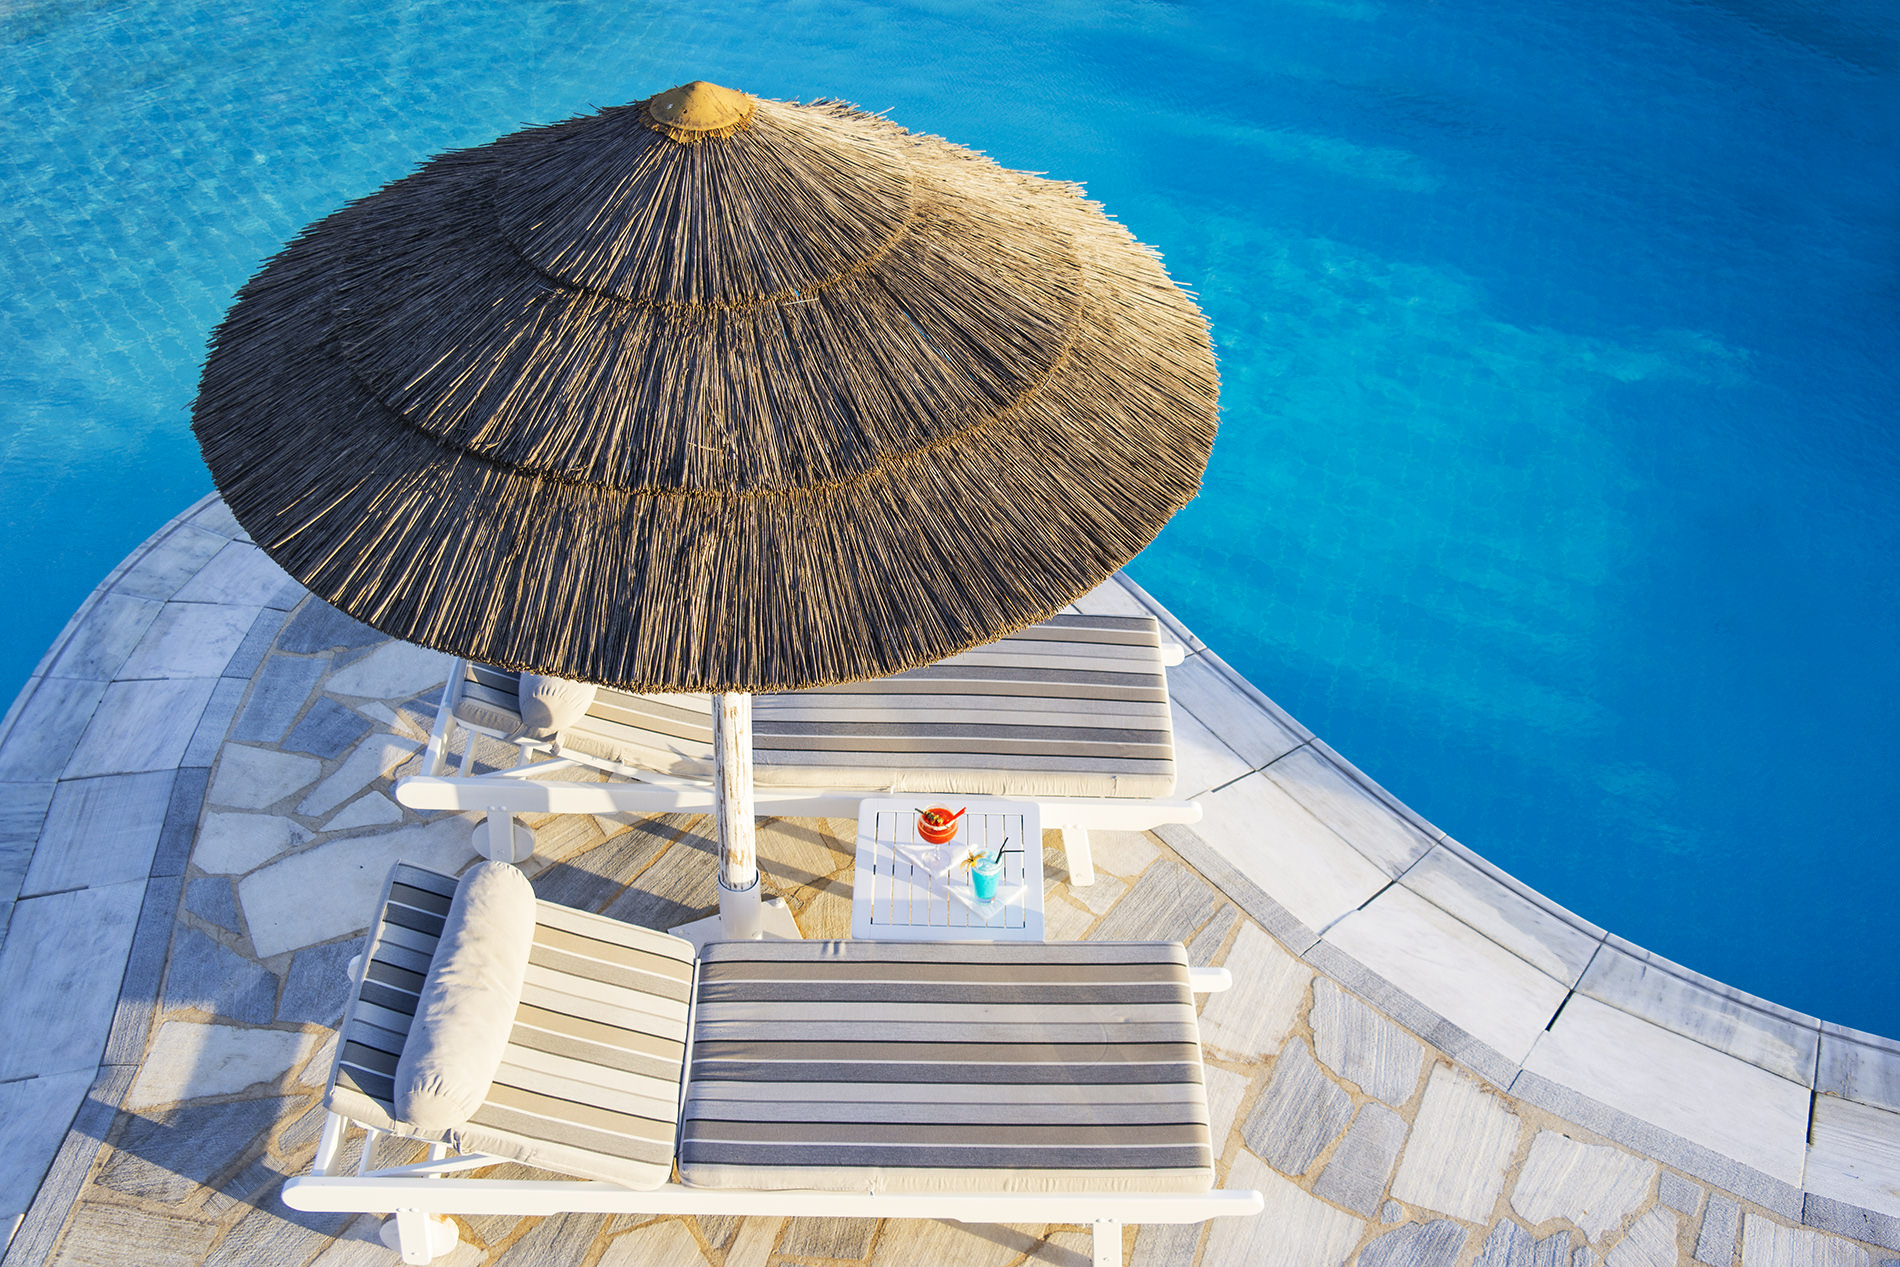 Hermes Mykonos Hotel - Exterior View